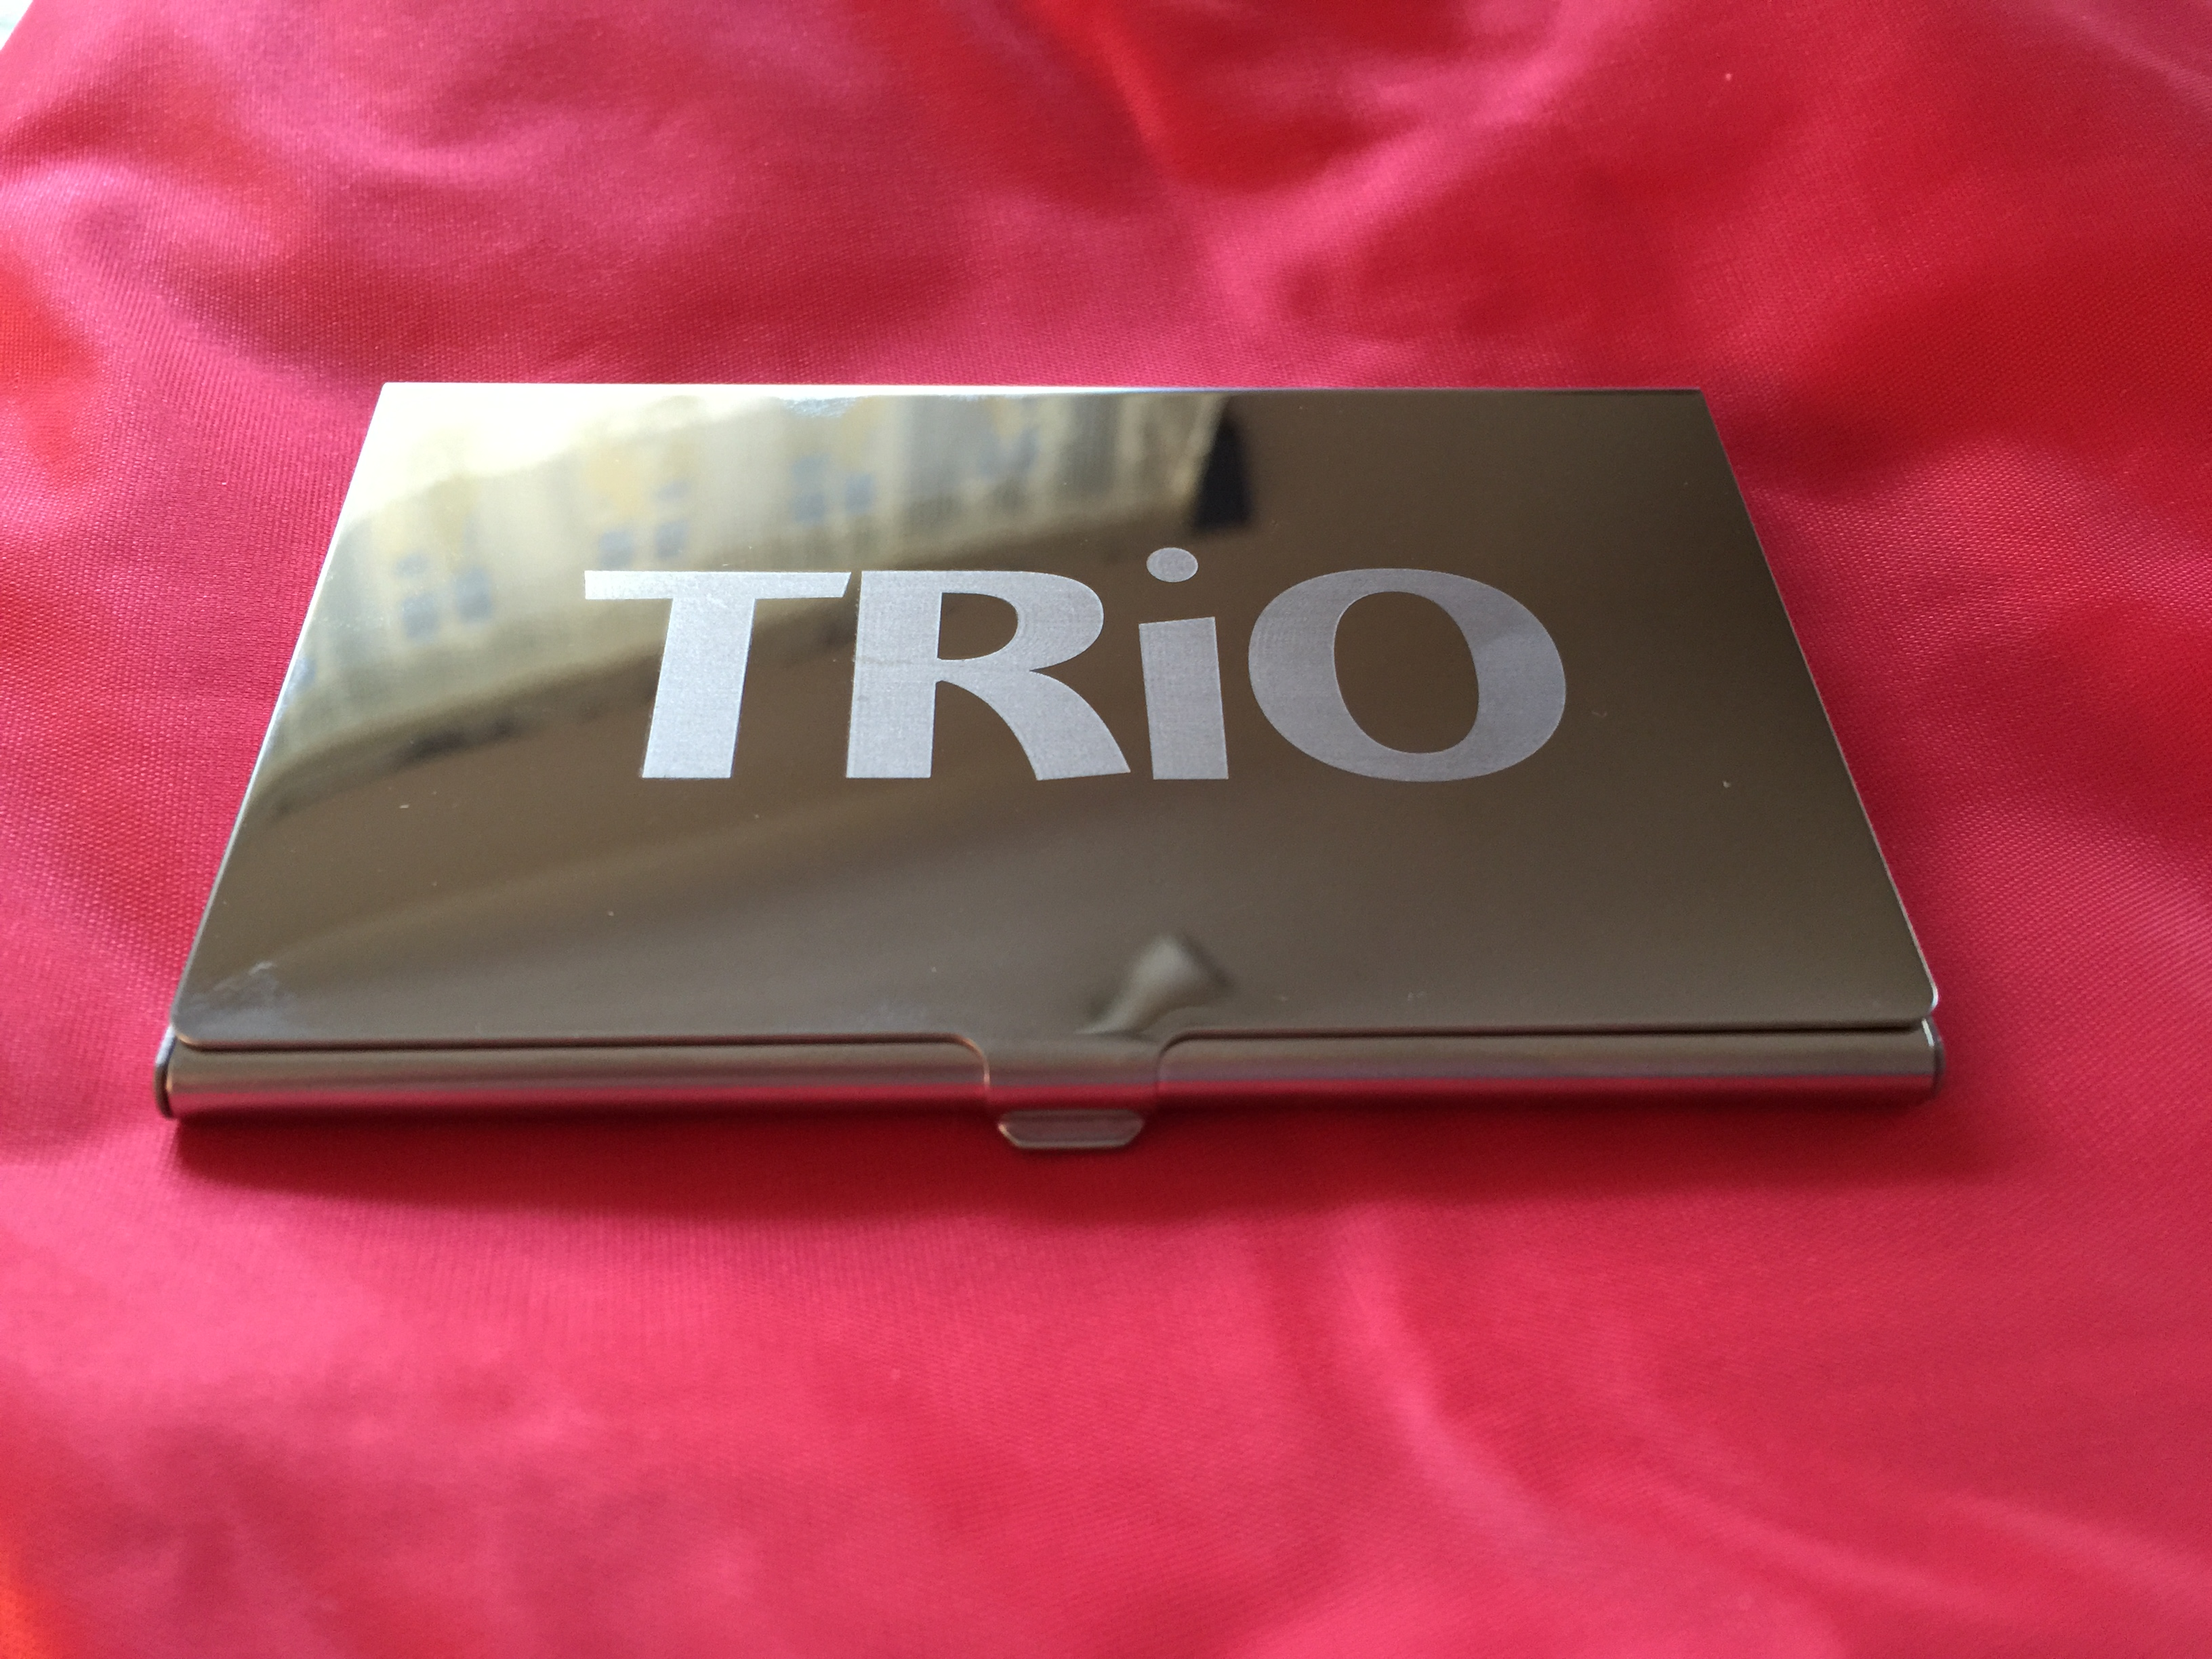 TRIO Business Card Holders — Friends of NAEOP